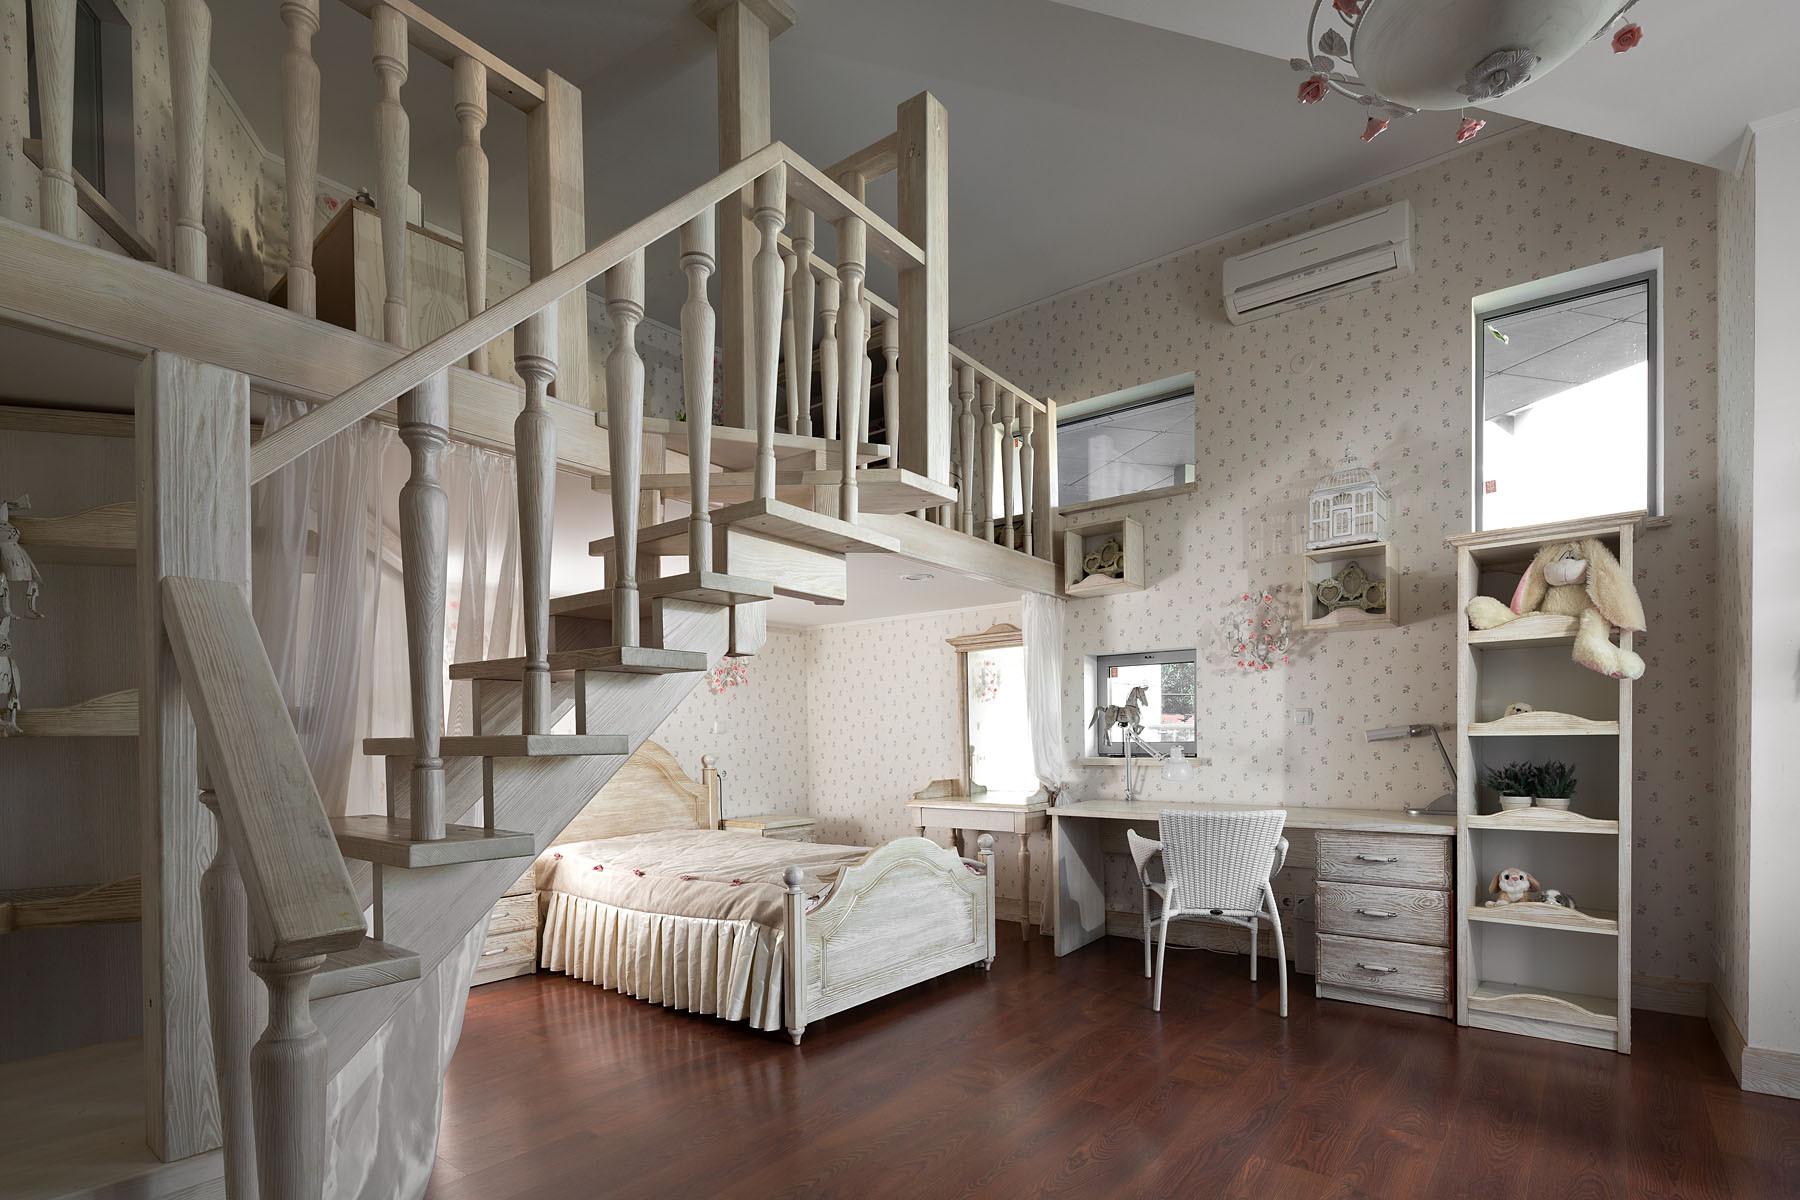 Gallery of house in dniepropetrovsk yuriy eroshik for Ristrutturare casa in economia